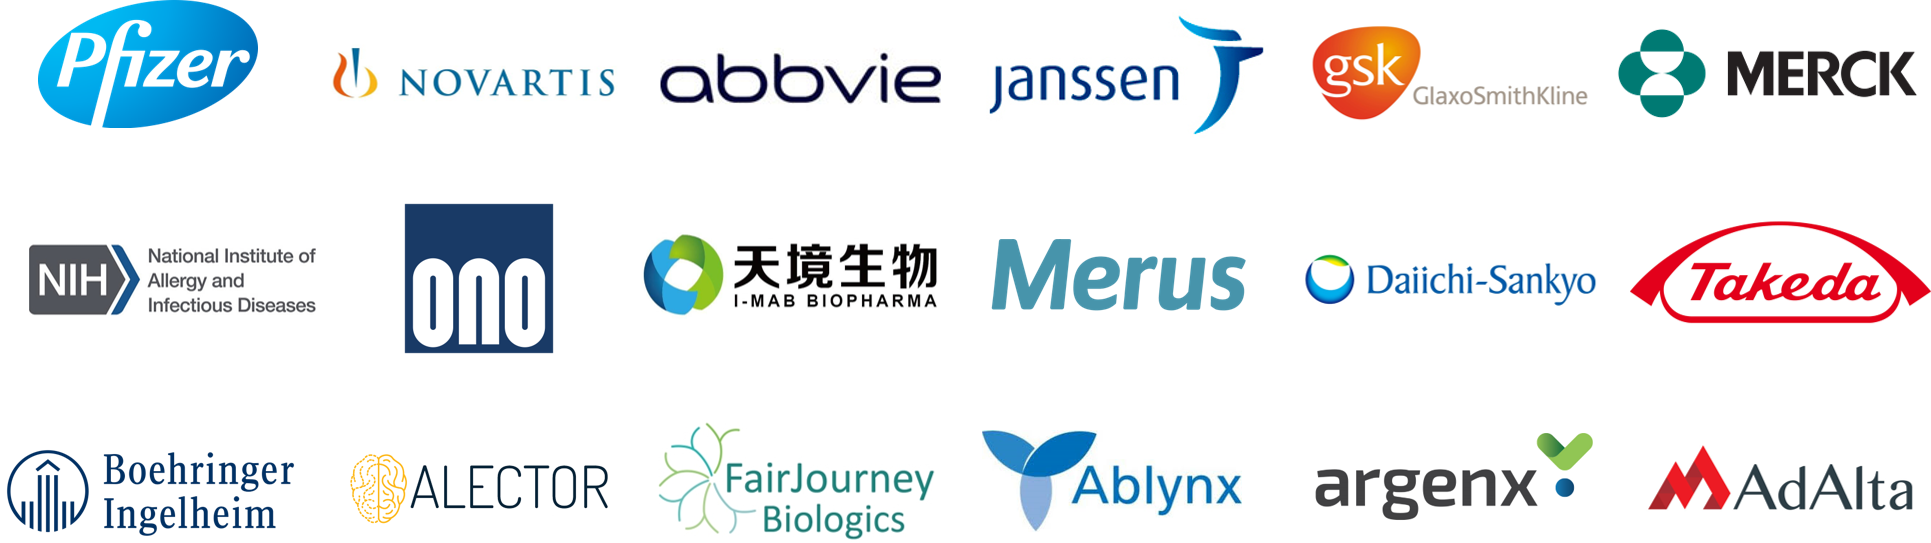 logos-2019v2